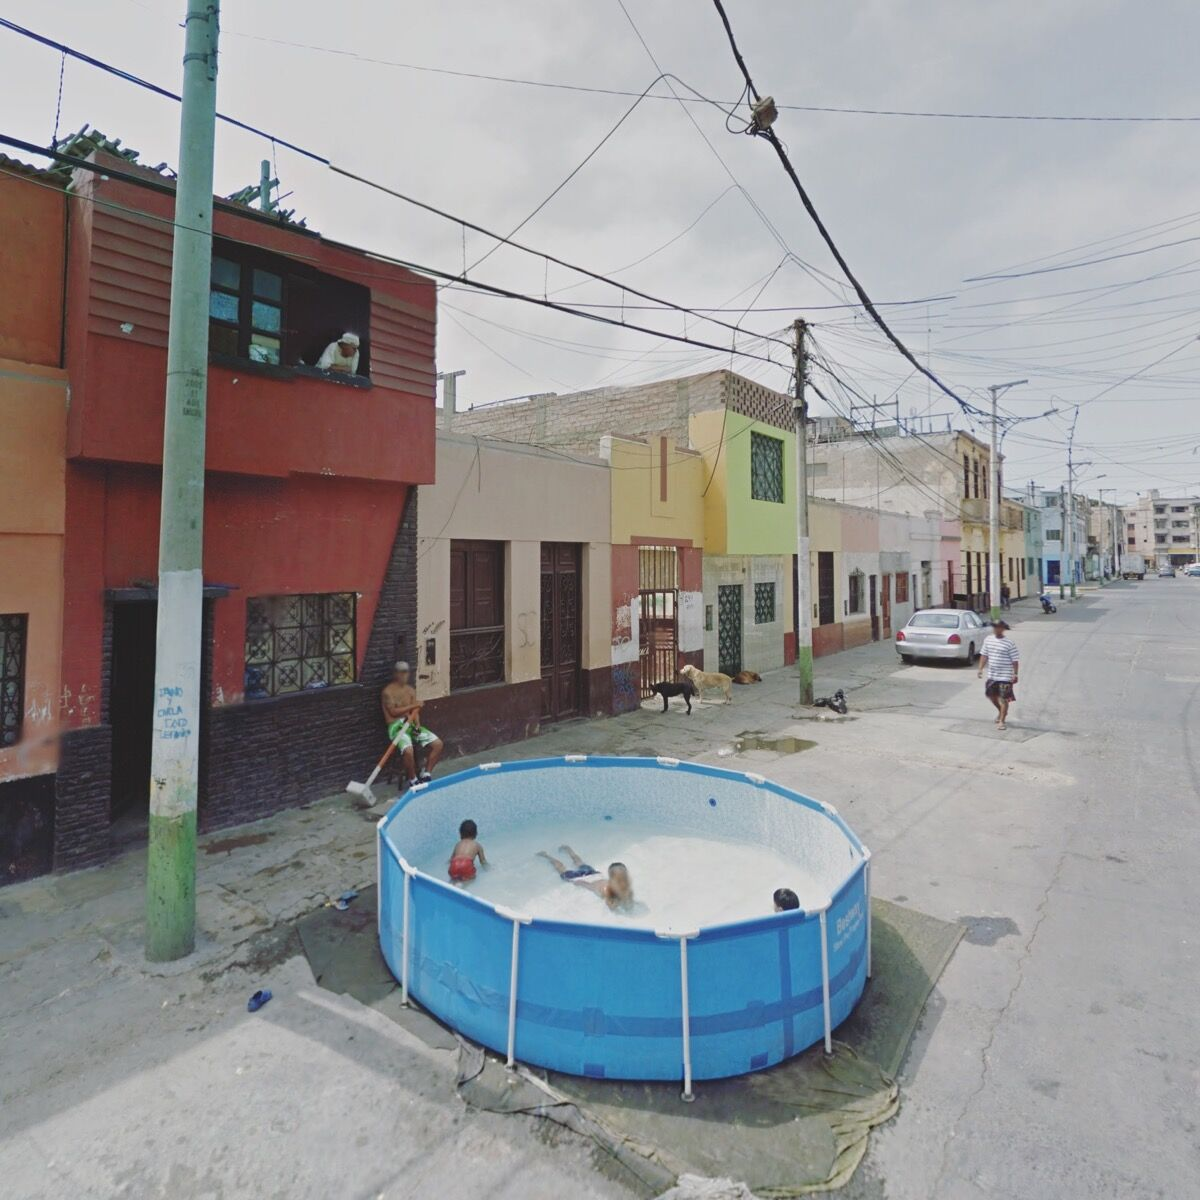 Callao District, Callao Region, Peru. Photograph by Jacqui Kenny via Google Street View.